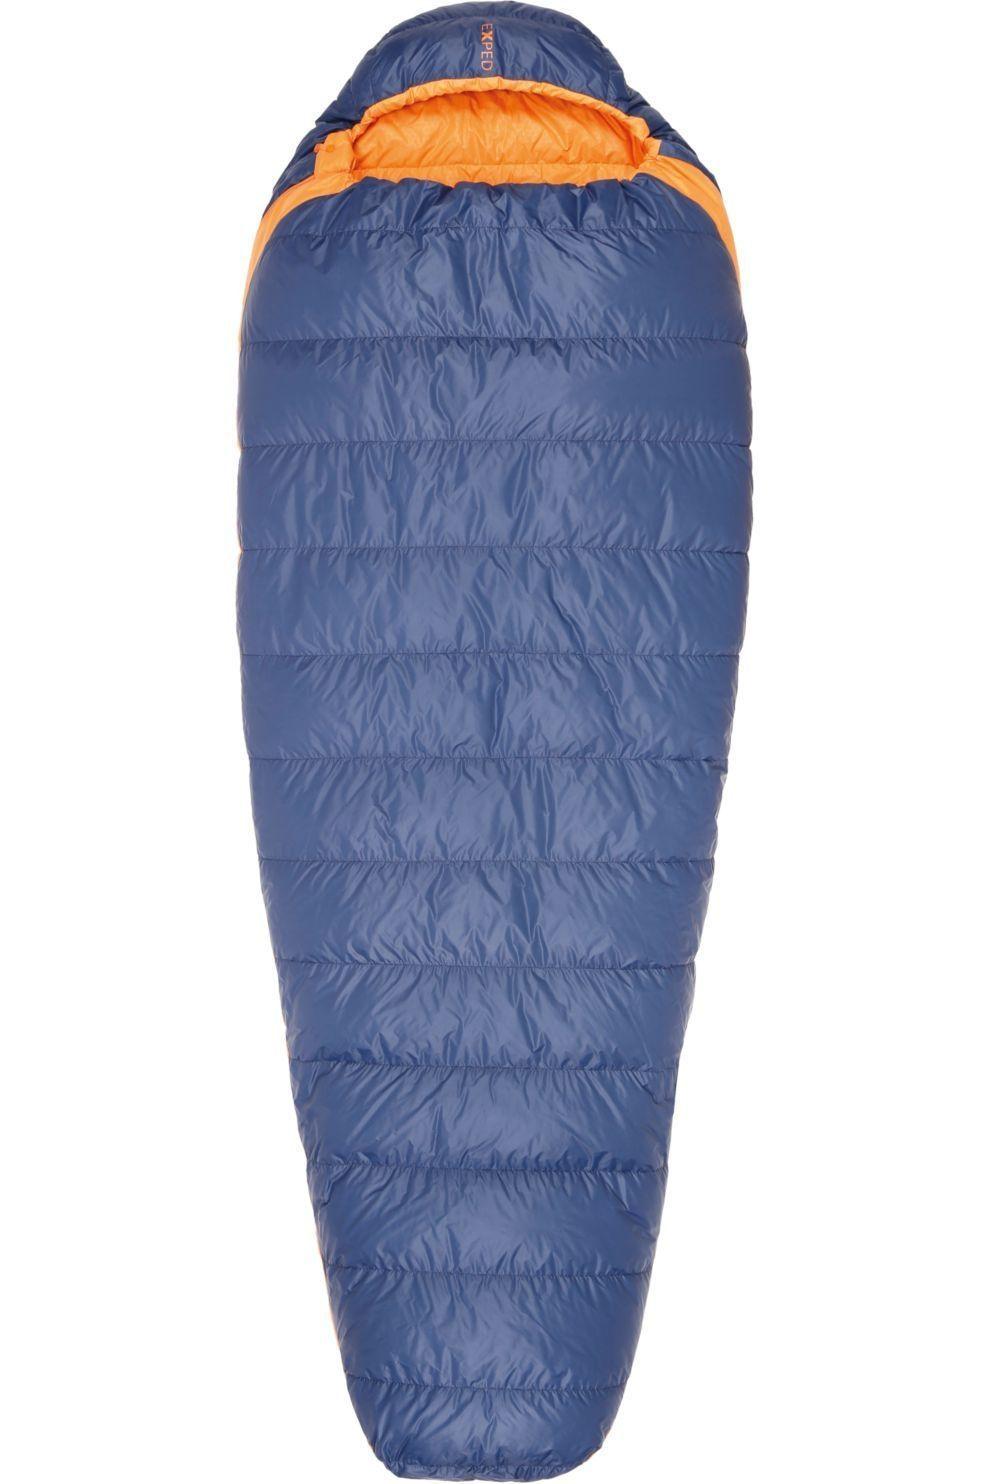 Exped Slaapzak Comfort -5° L - Blauw/Oranje - Maat: LEFT